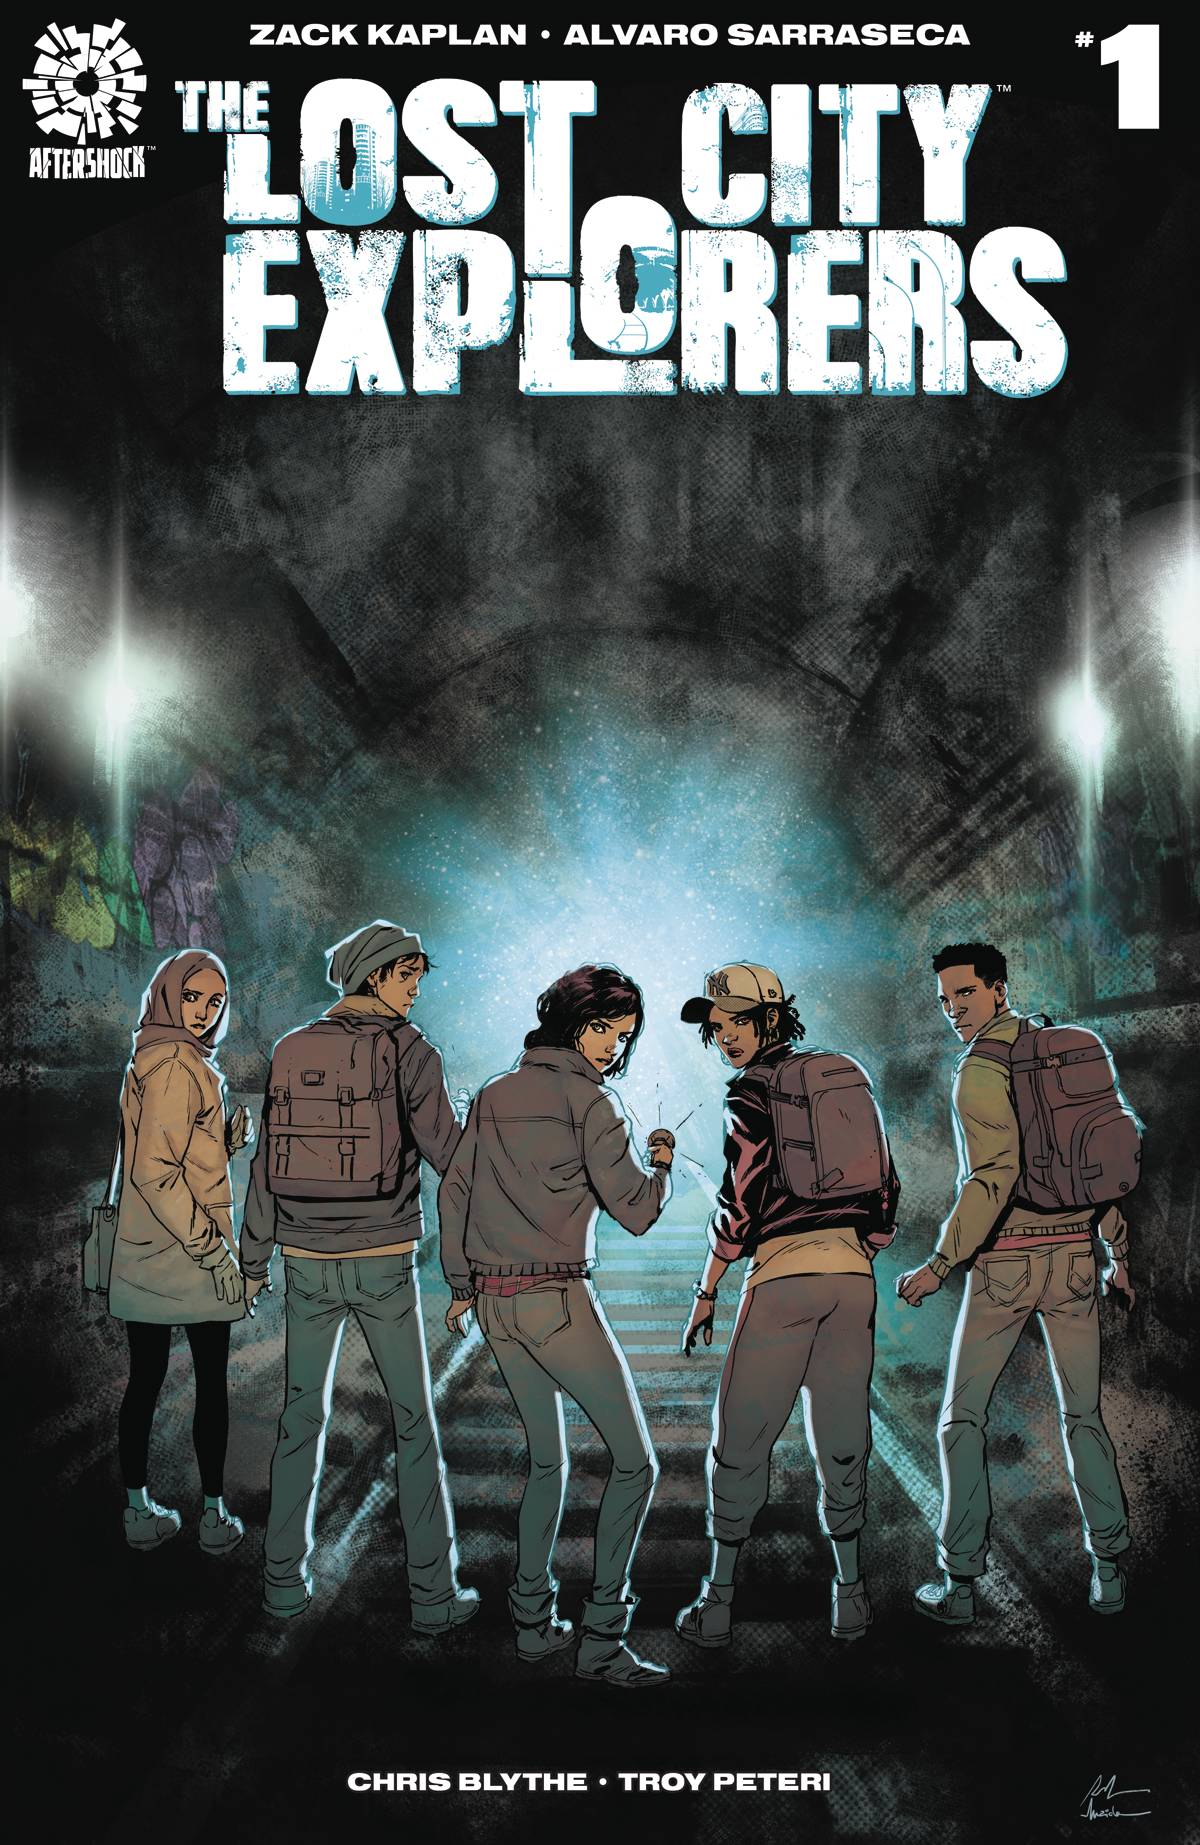 LOST CITY EXPLORERS #1